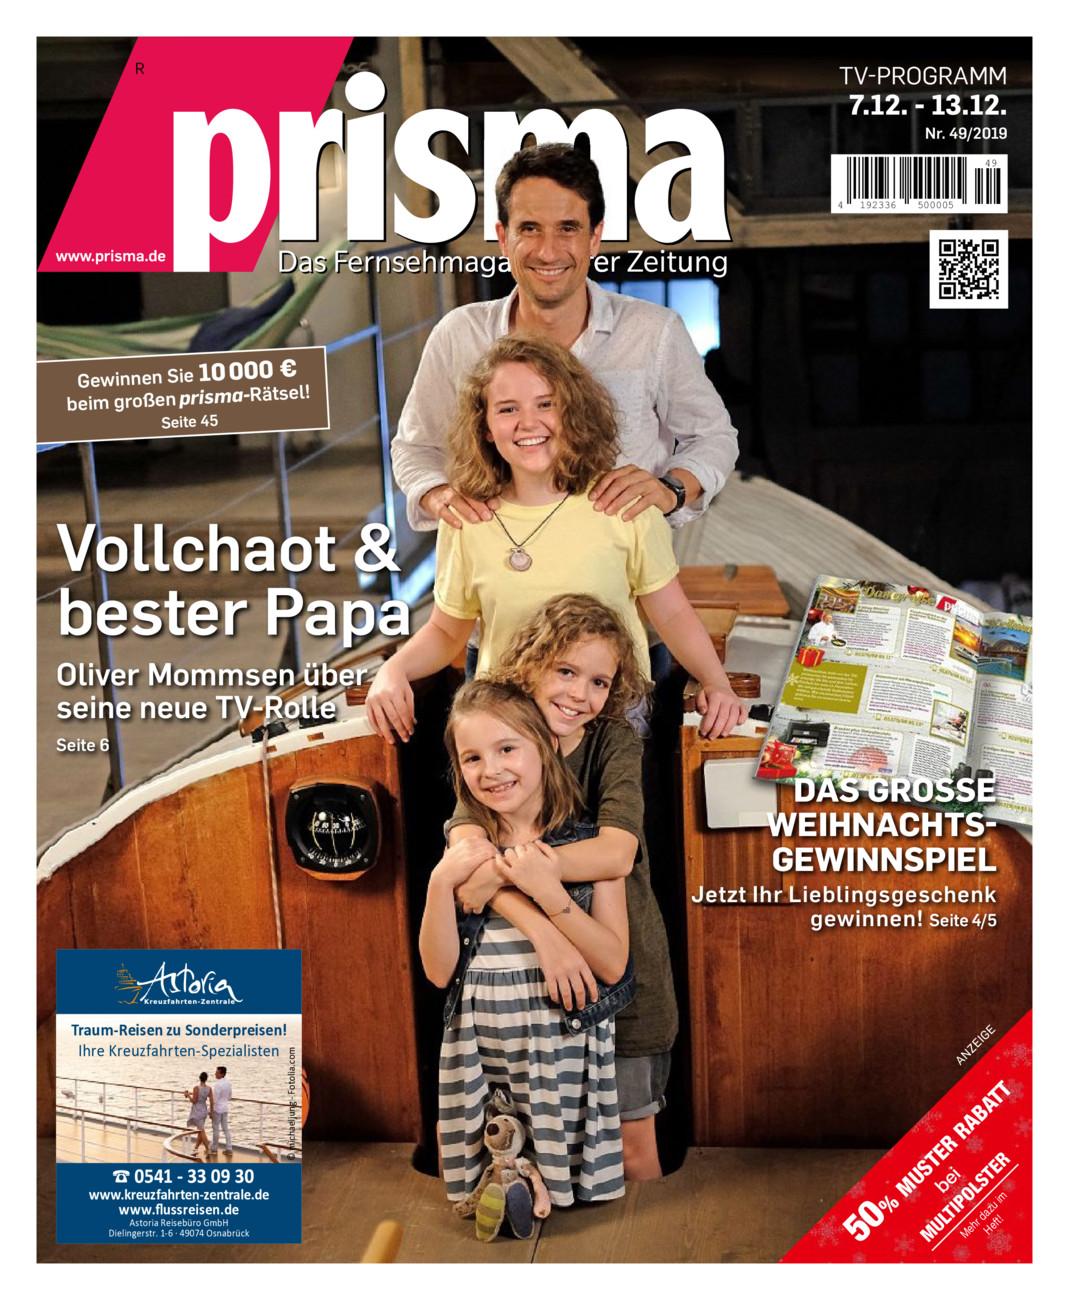 Prisma 7.-13.12.